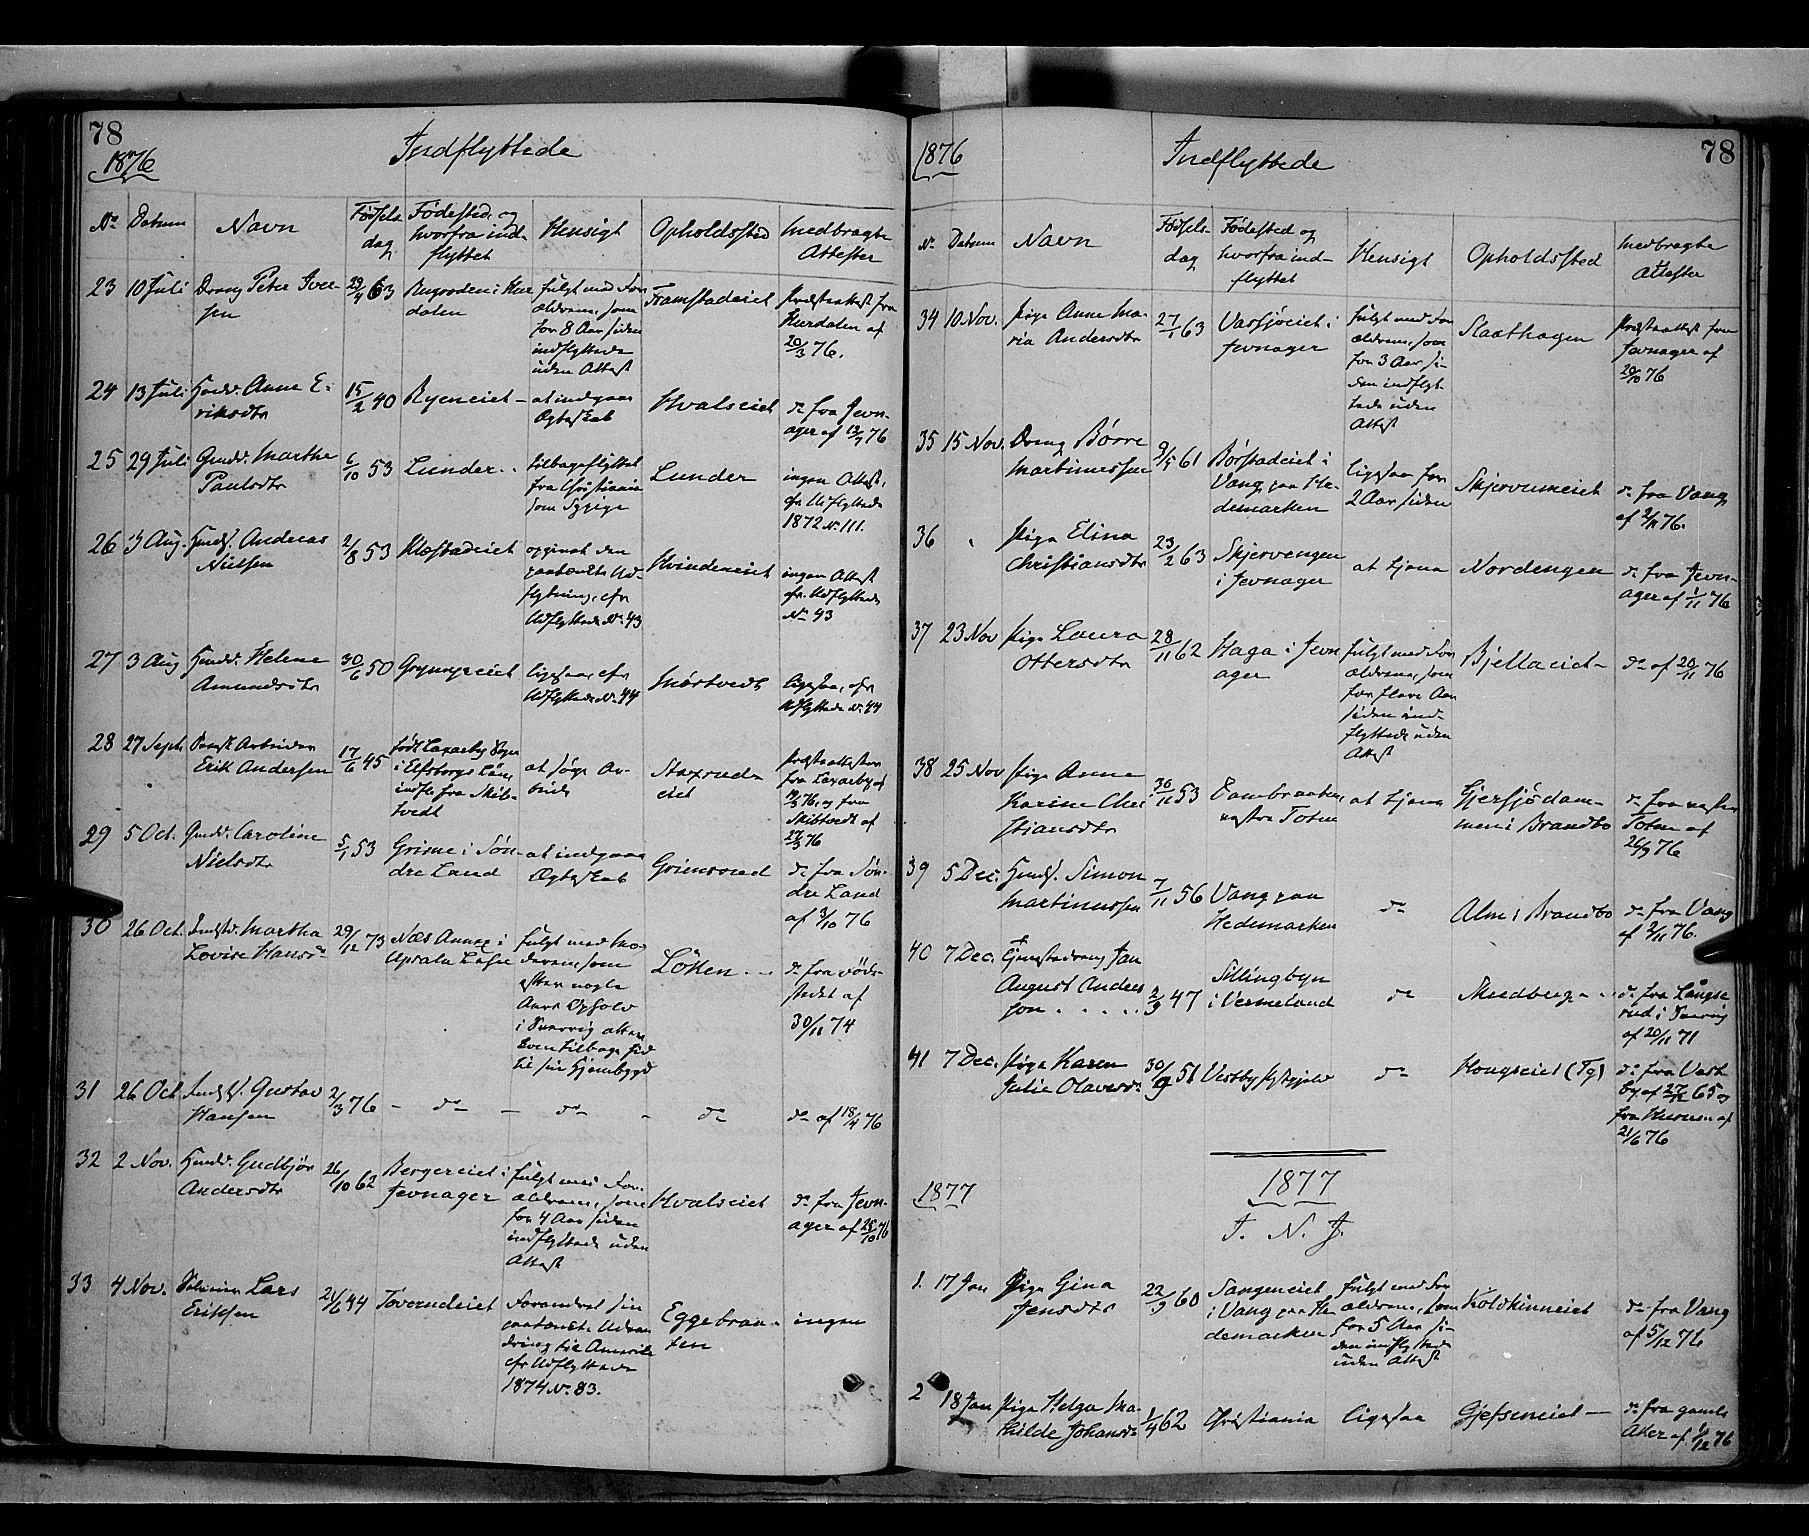 SAH, Gran prestekontor, Ministerialbok nr. 13, 1875-1879, s. 78